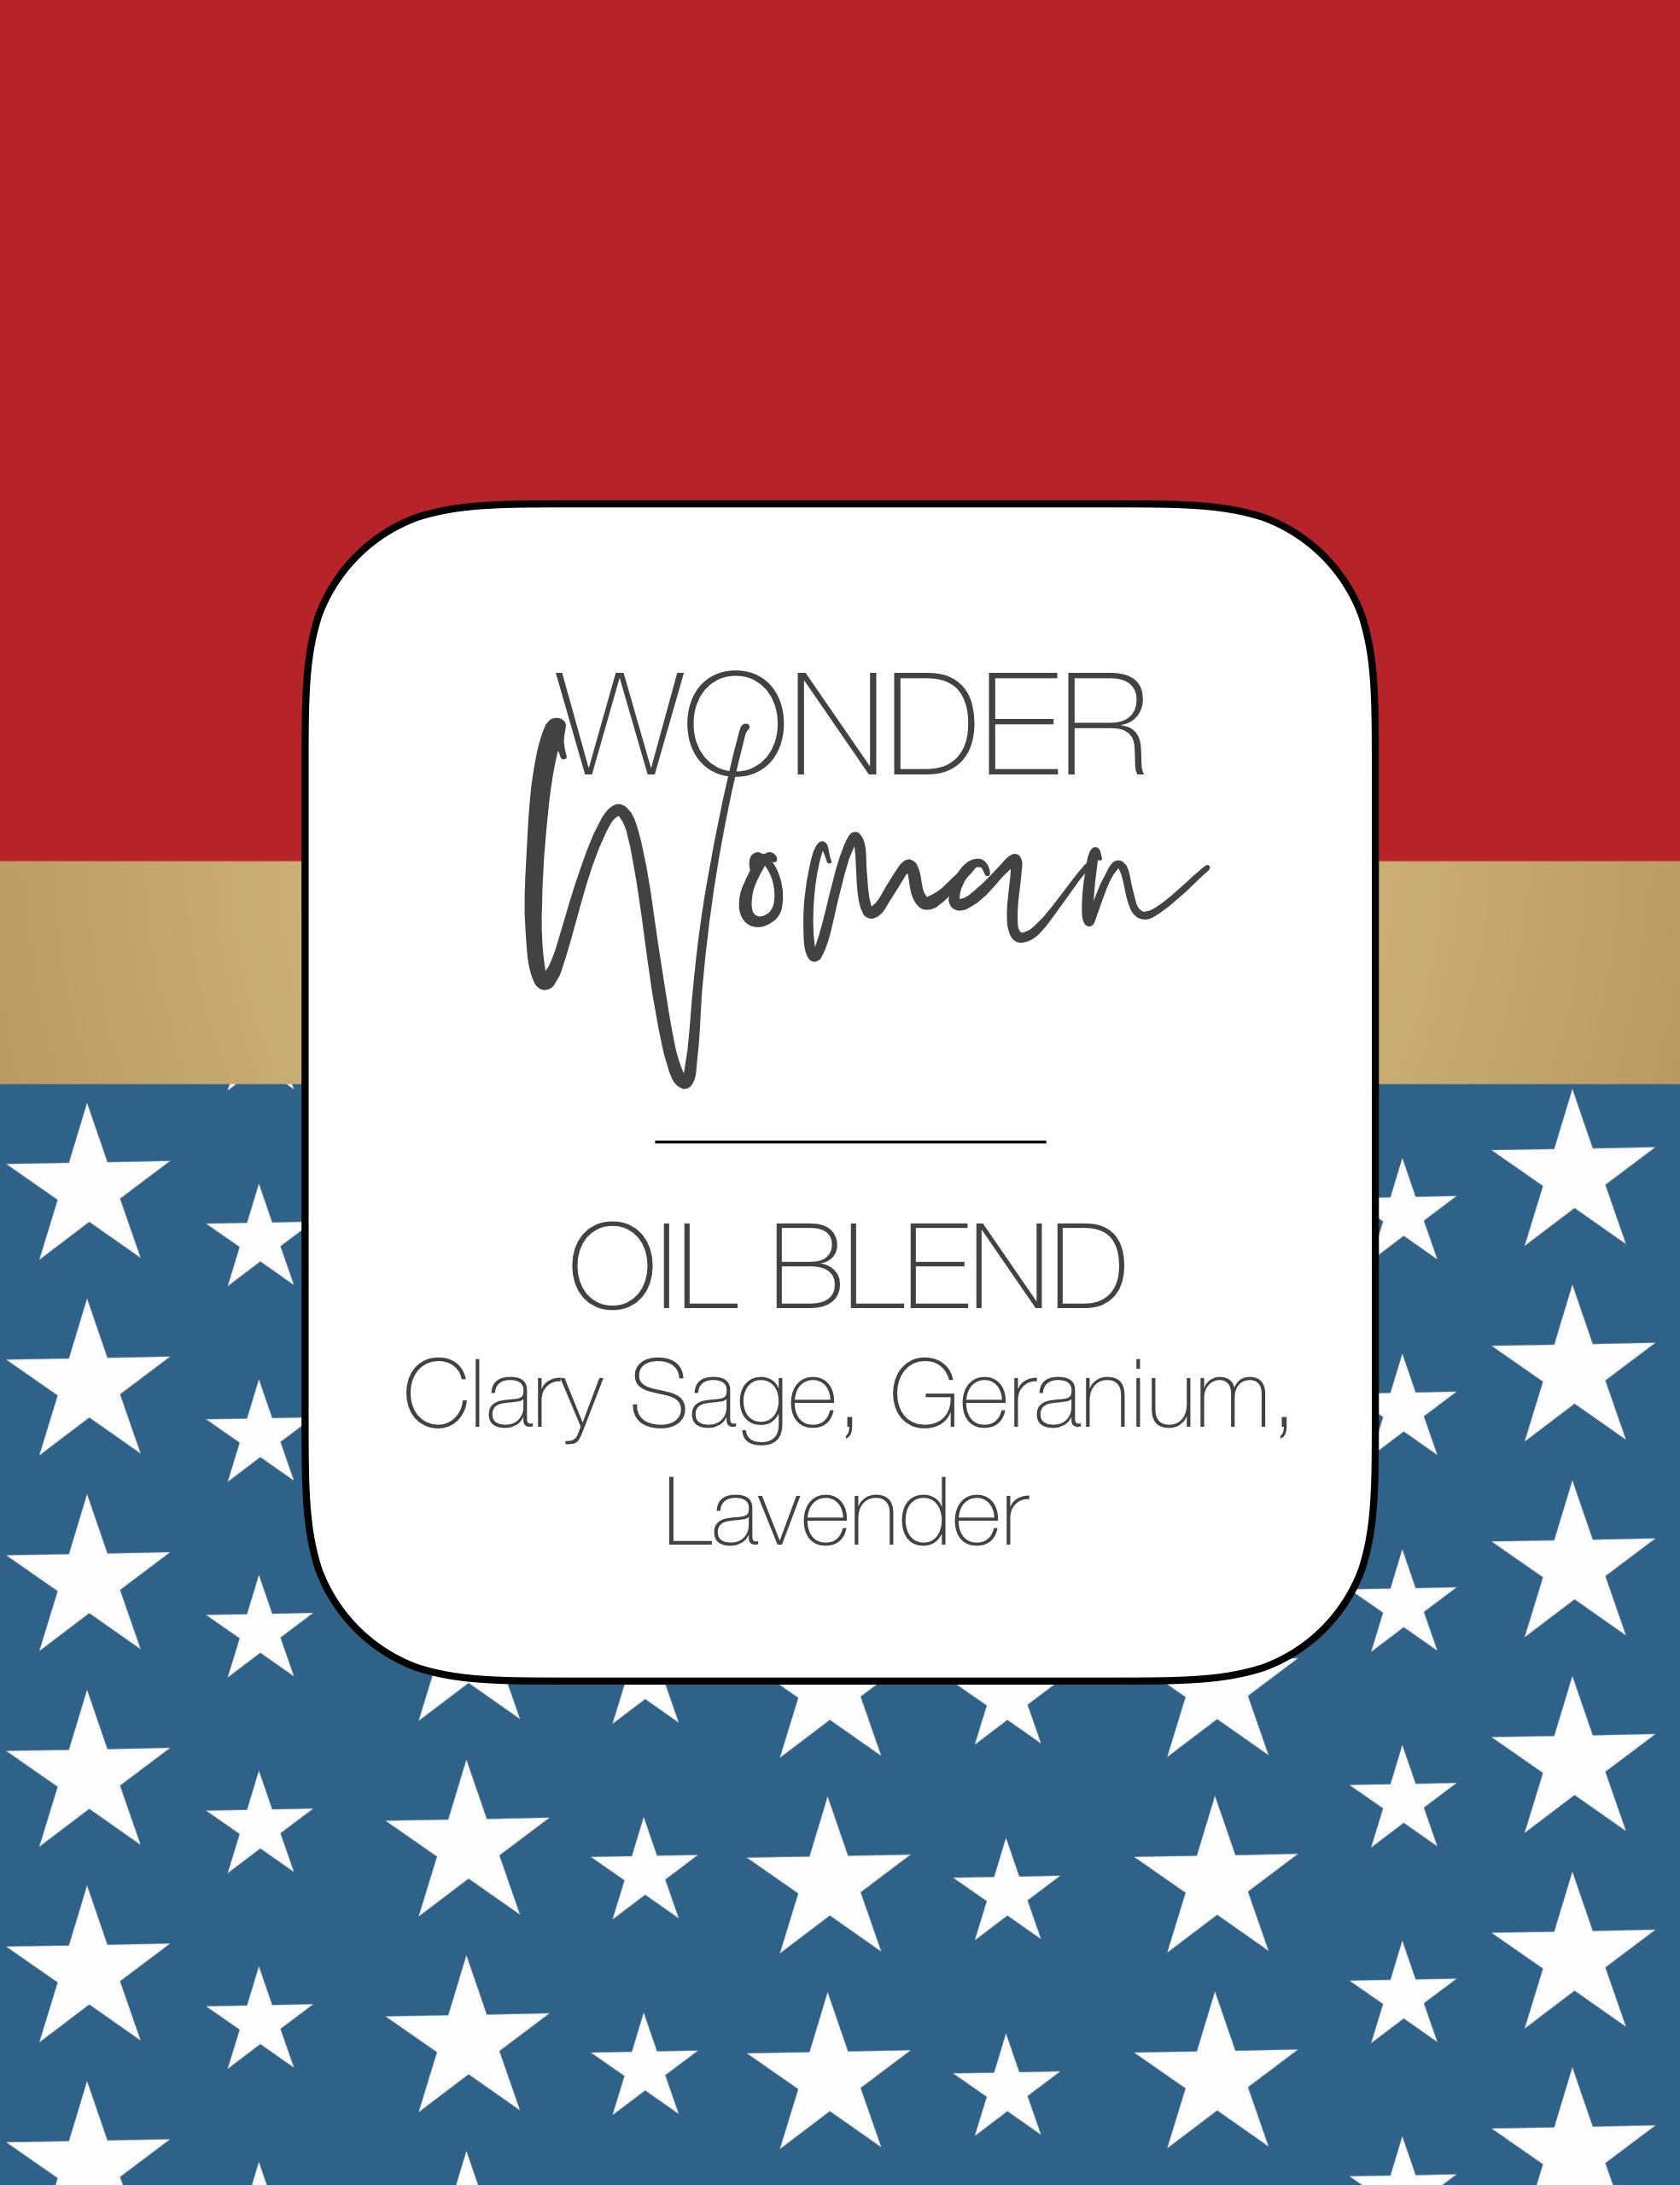 Wonder Woman Roller Bottle Blend Hoo Happiness